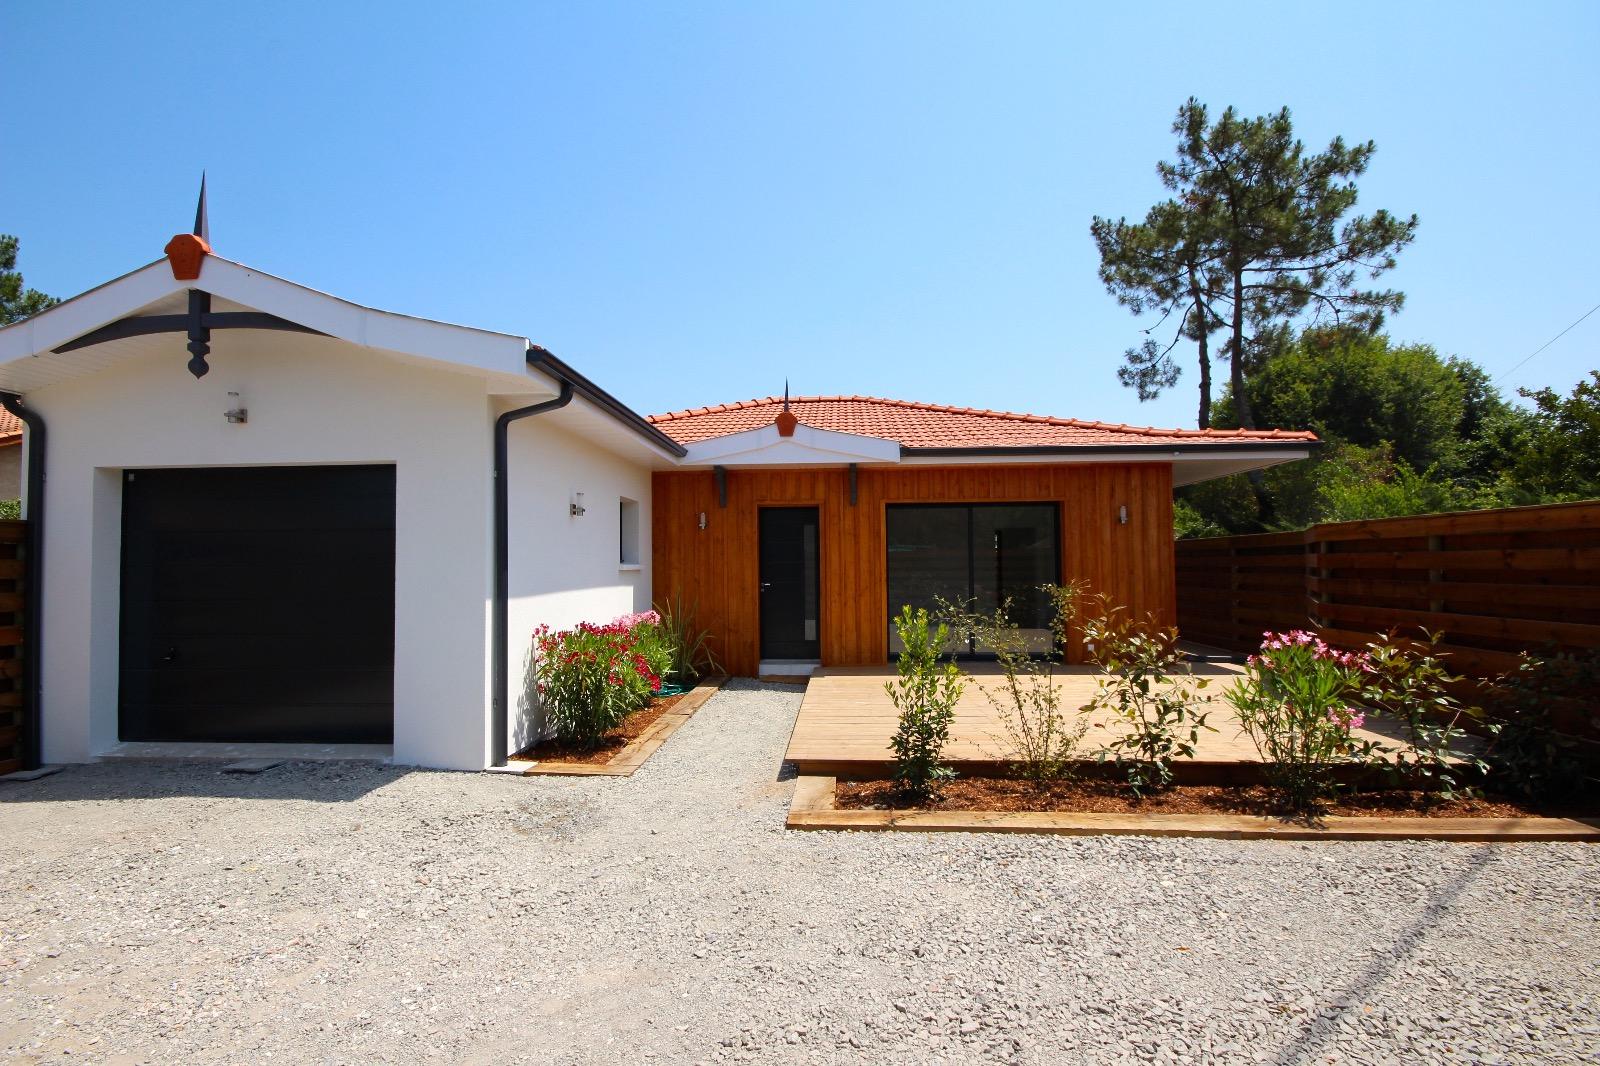 Vente villa gujan mestras 33470 93m avec 4 pi ce s for Achat maison gujan mestras